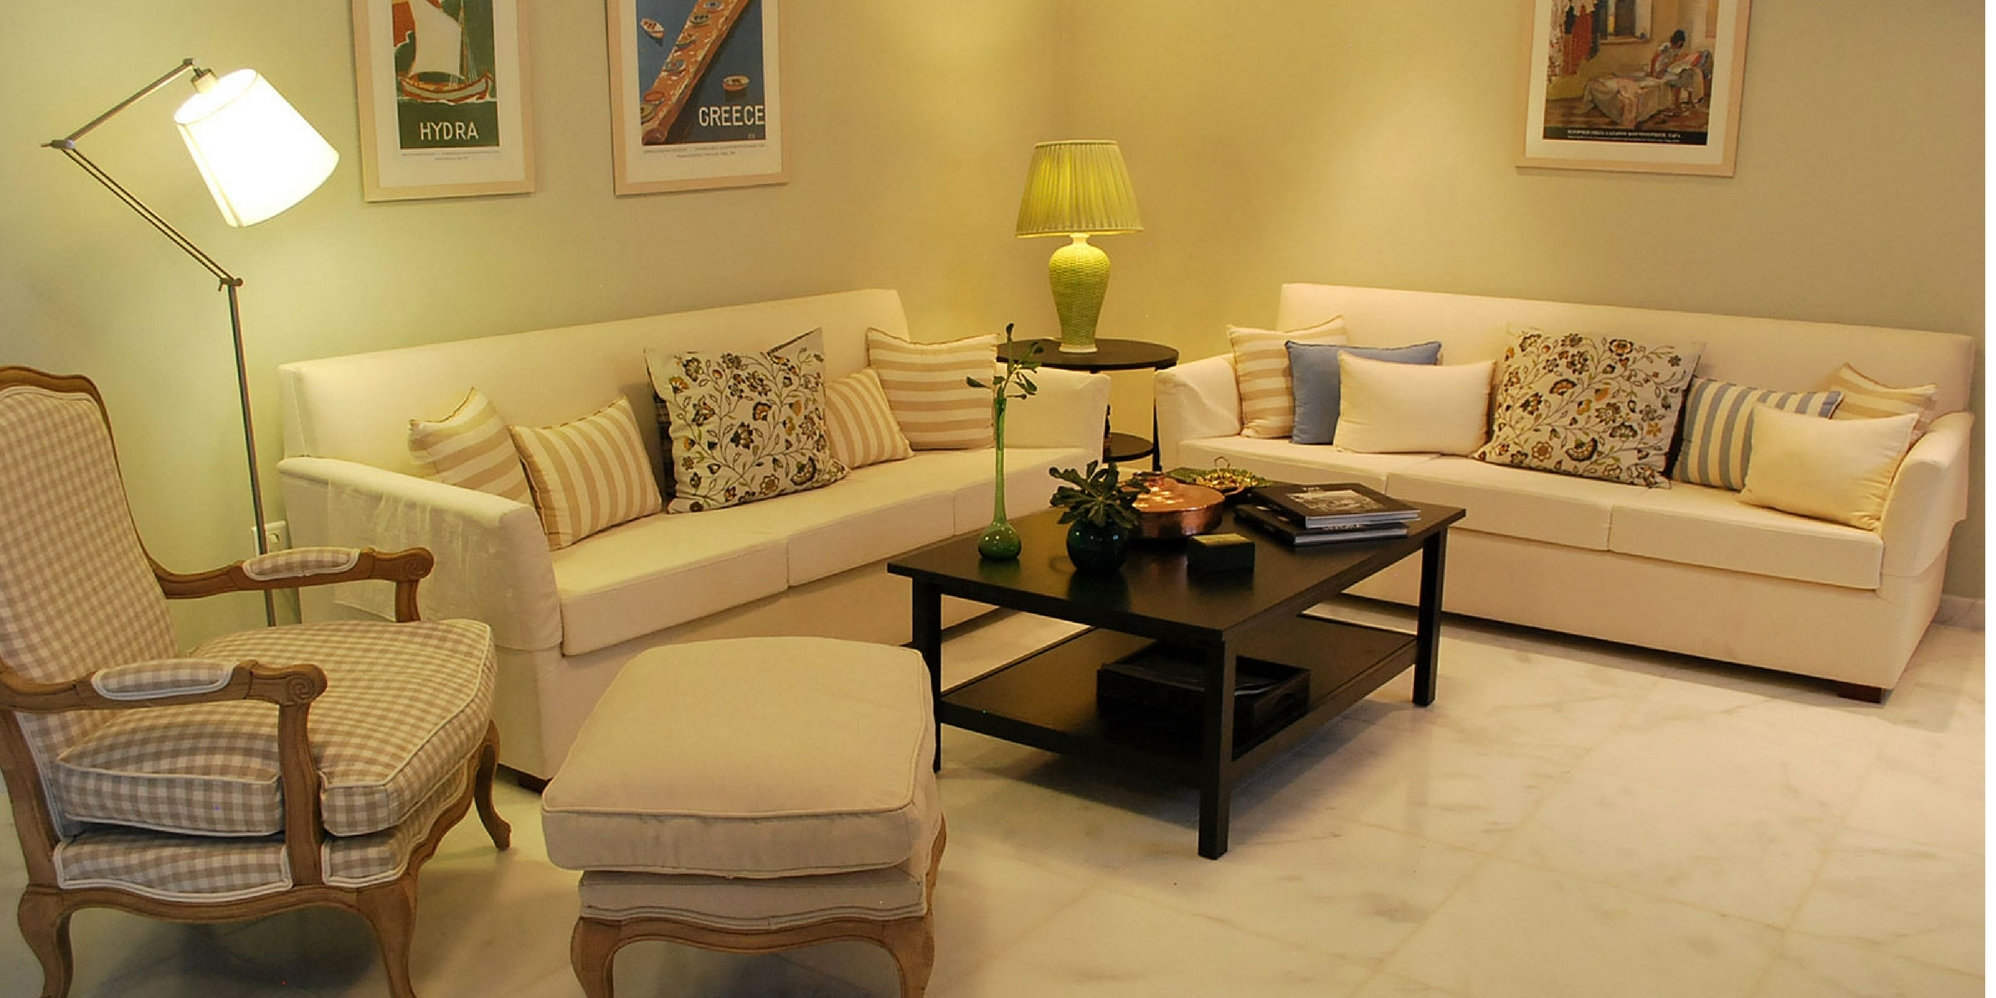 Hydra's Chromata Superior Luxury Home - Olive